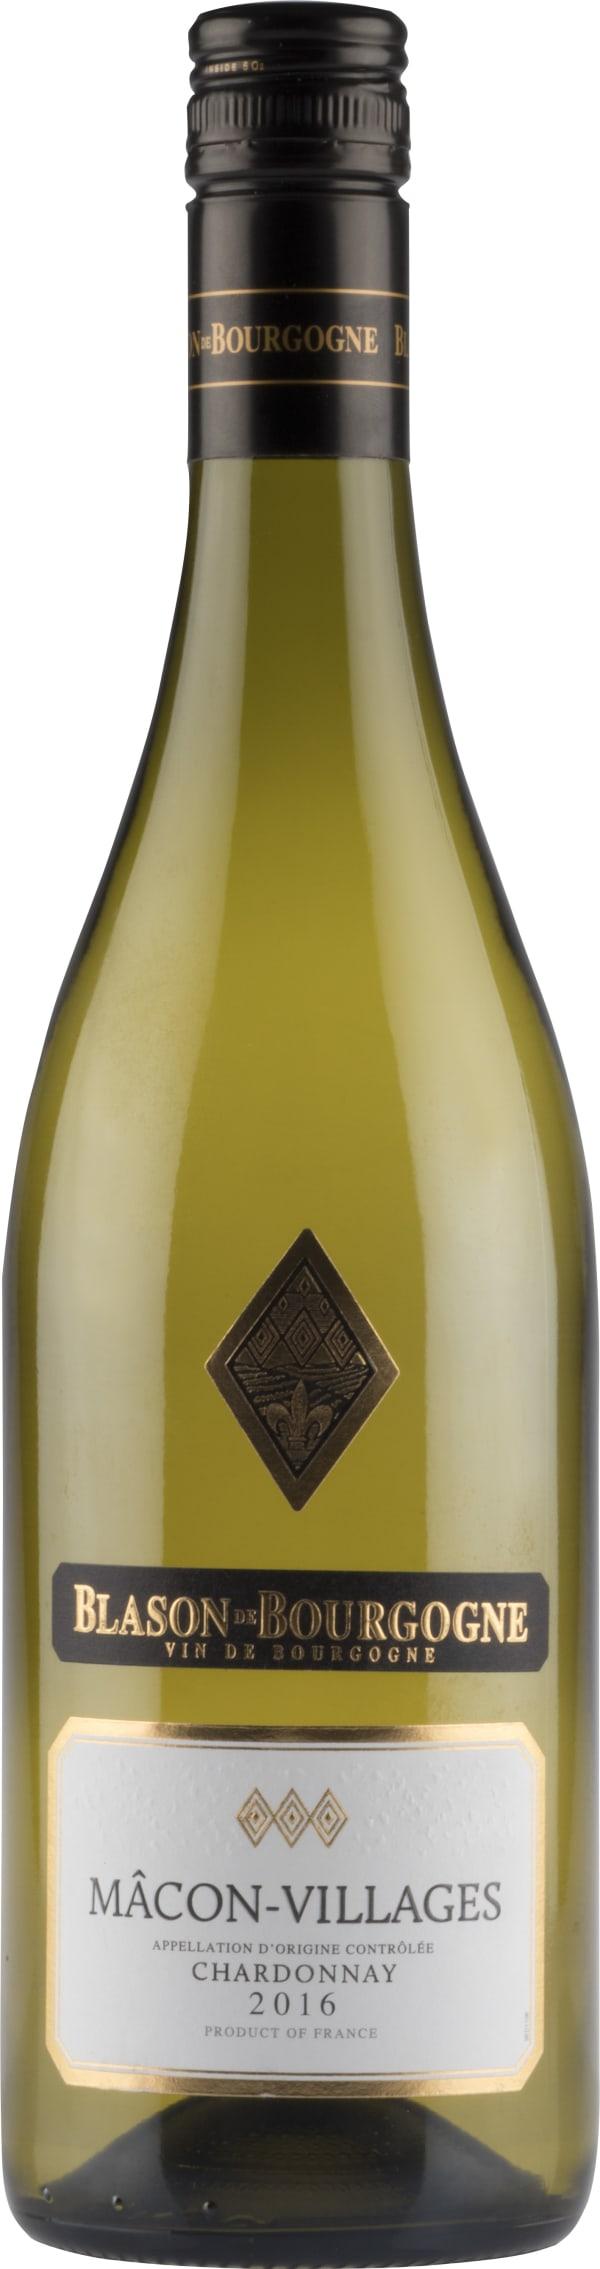 Blason de Bourgogne Chardonnay 2015